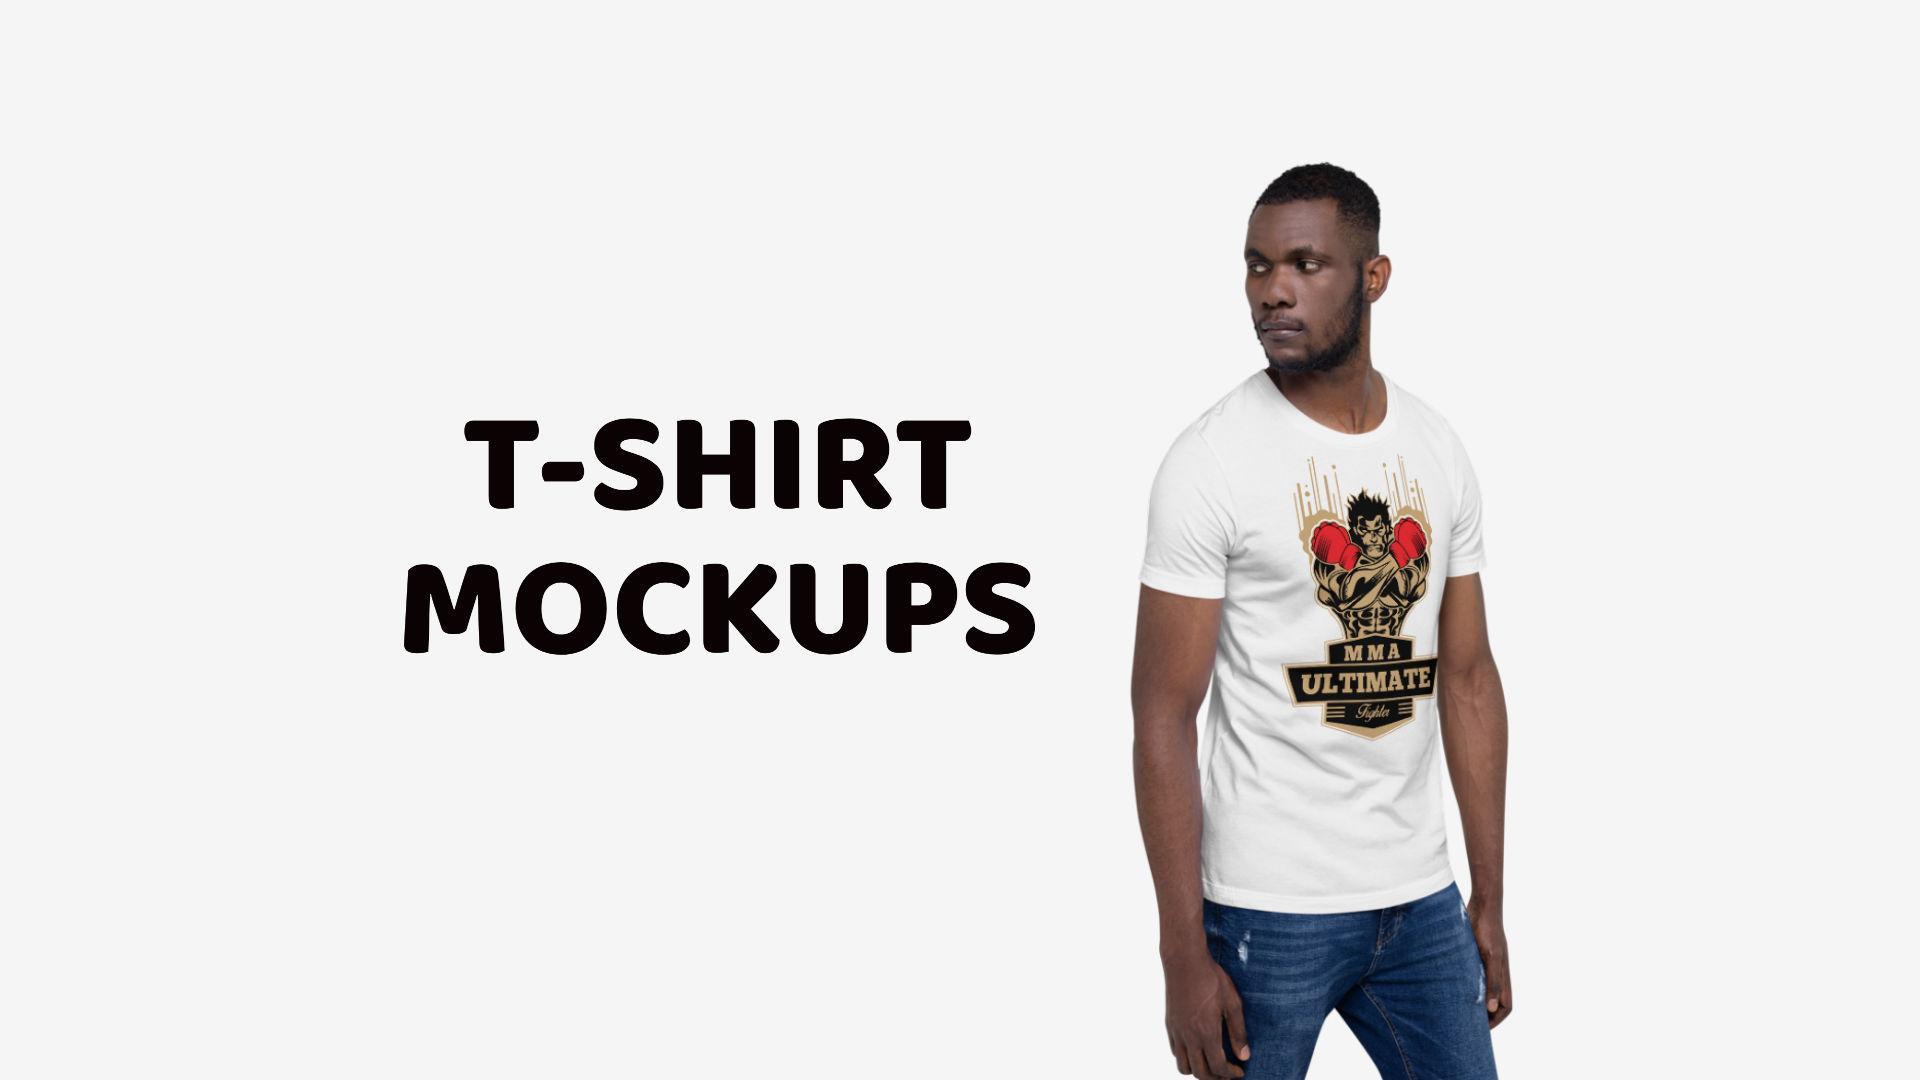 Best T-Shirt Mockup Templates and Generators